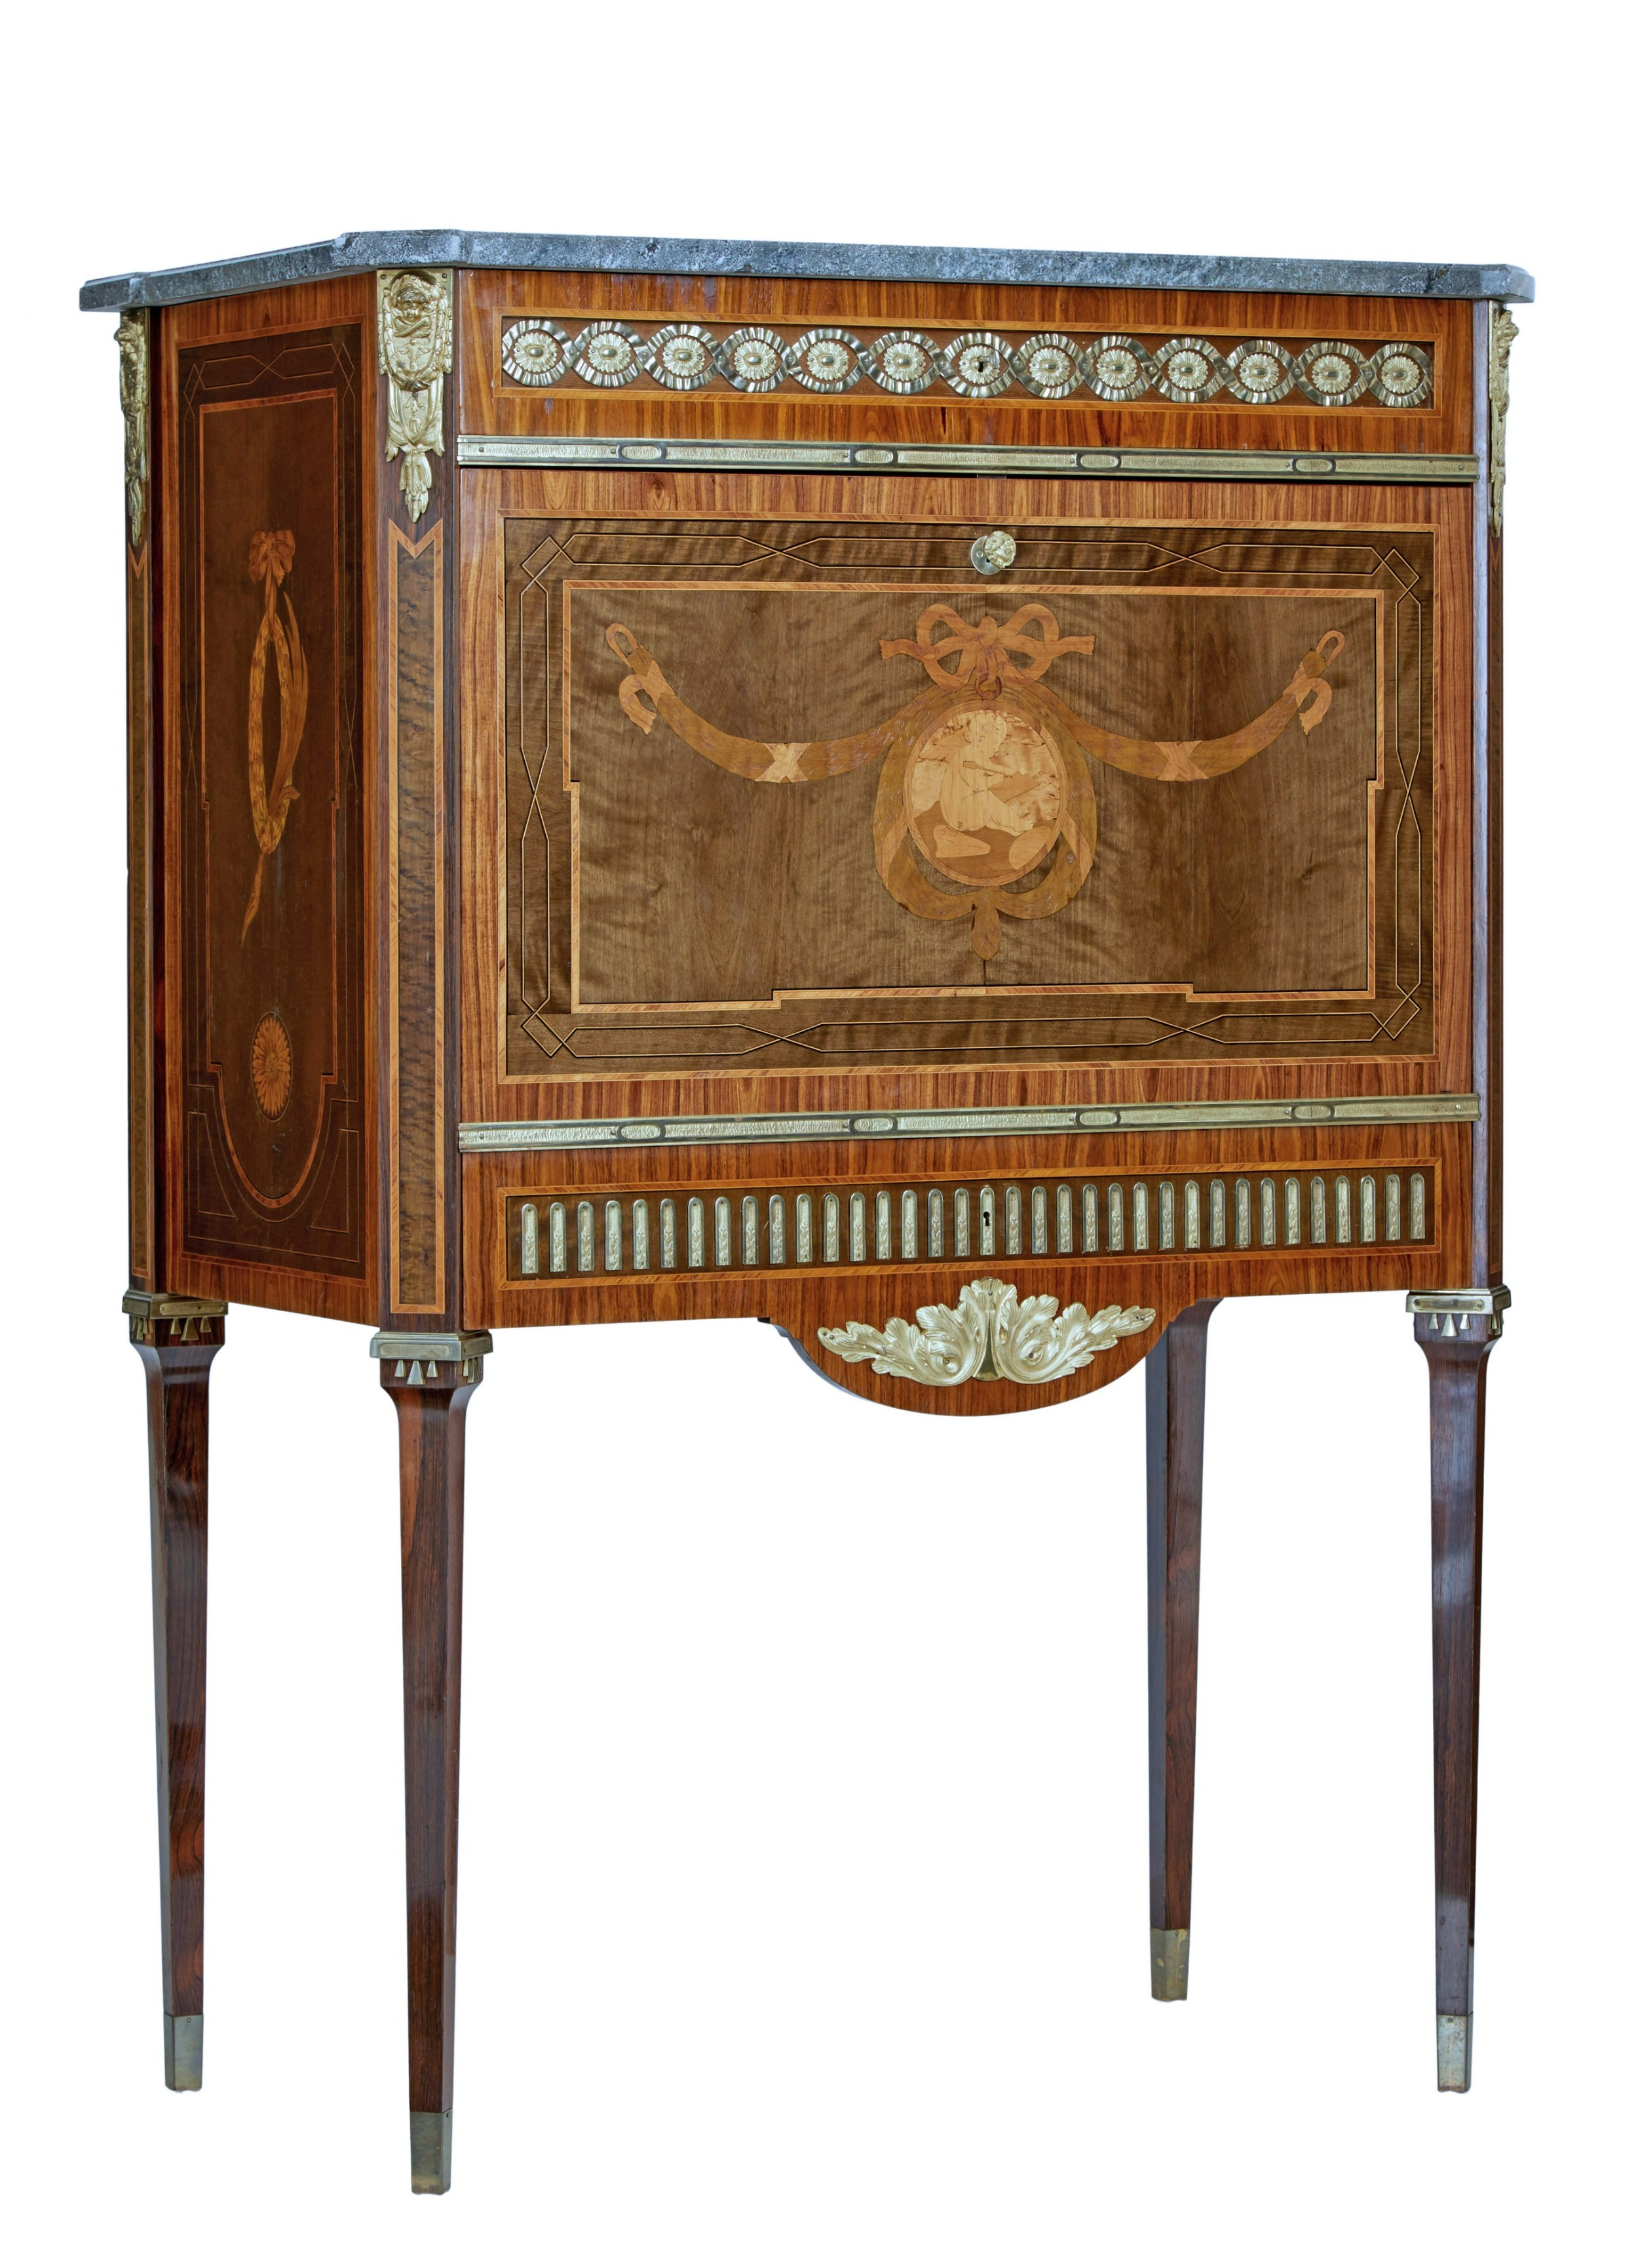 1930's kingwood inlaid swedish marble top secretaire